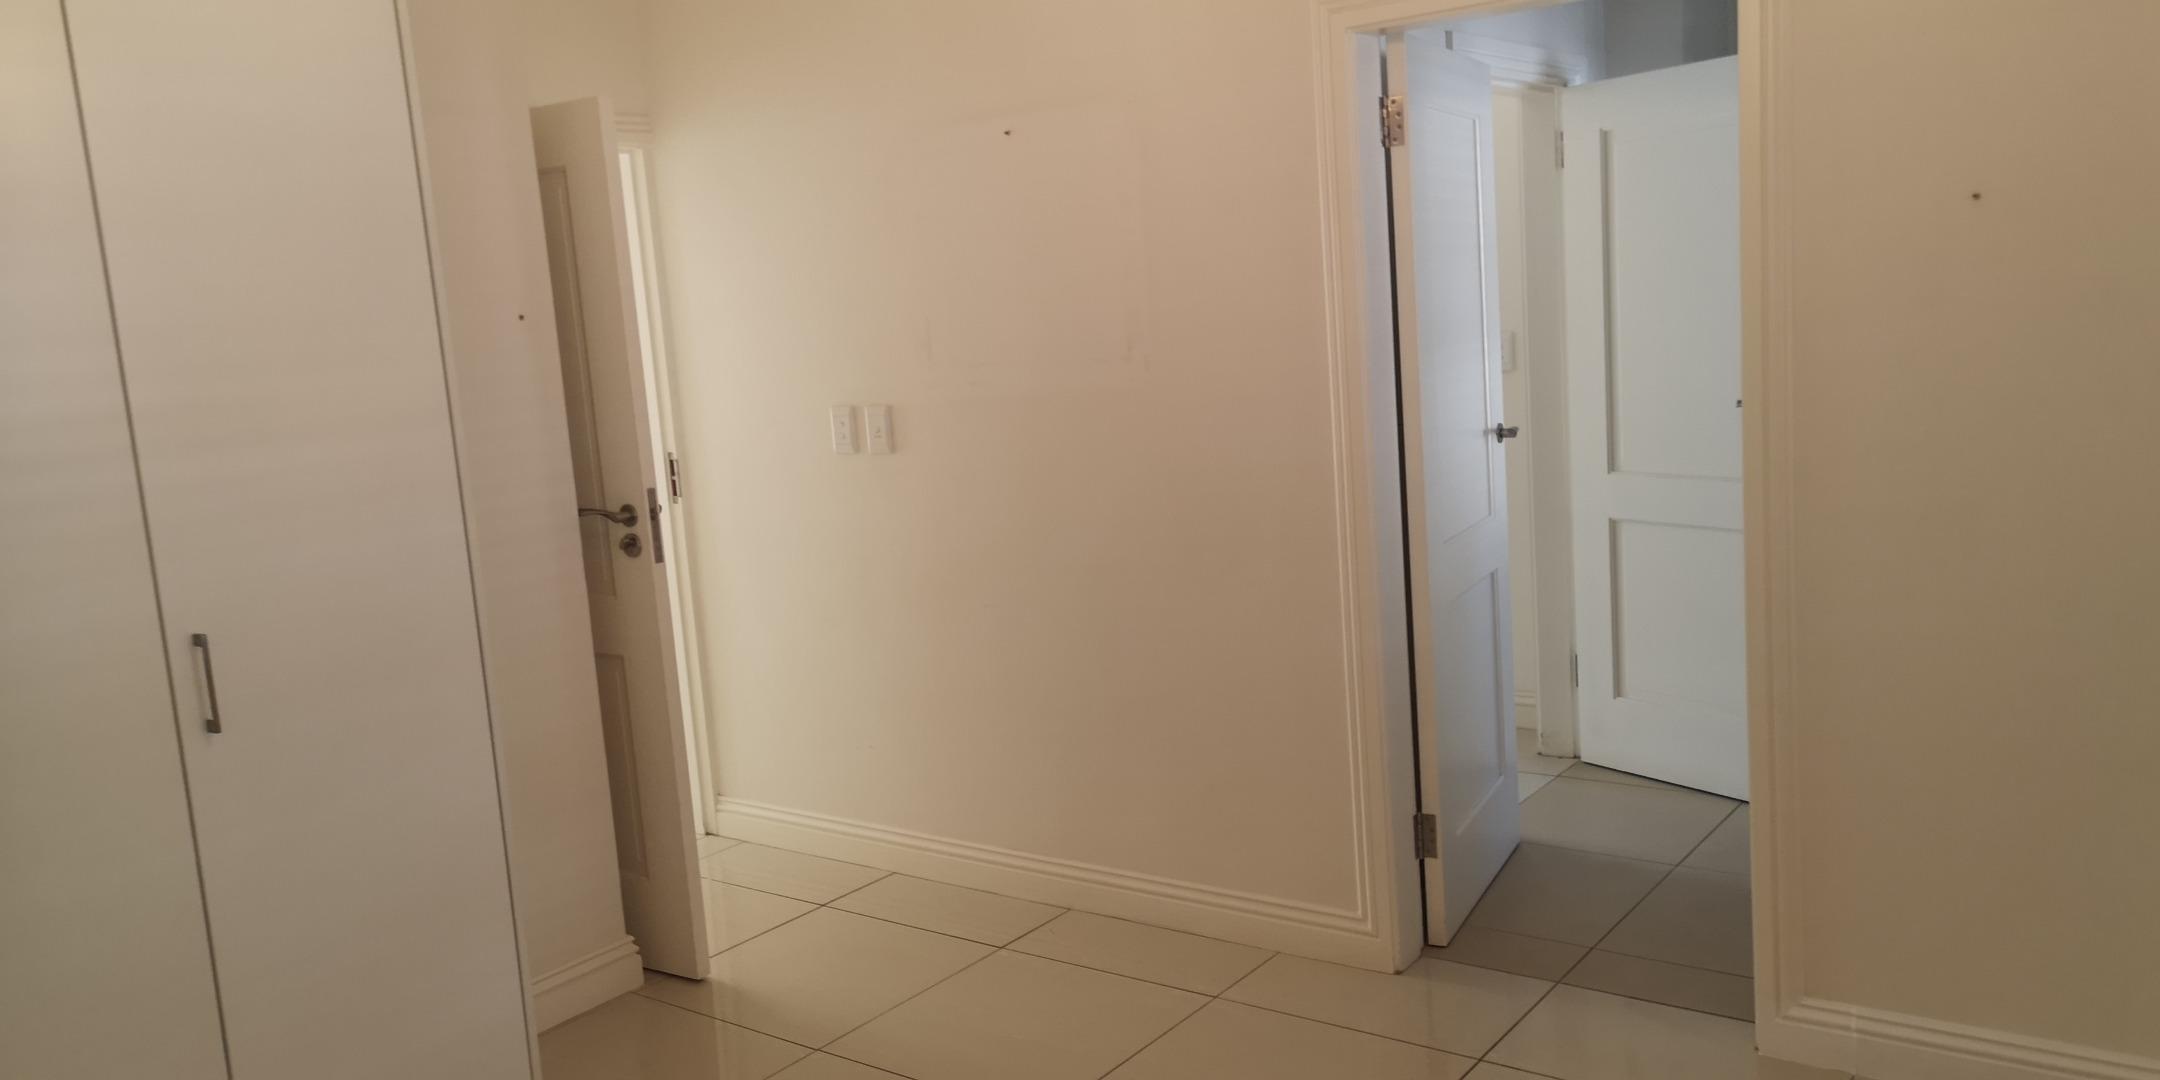 2 Bedroom Townhouse For Sale in Senderwood